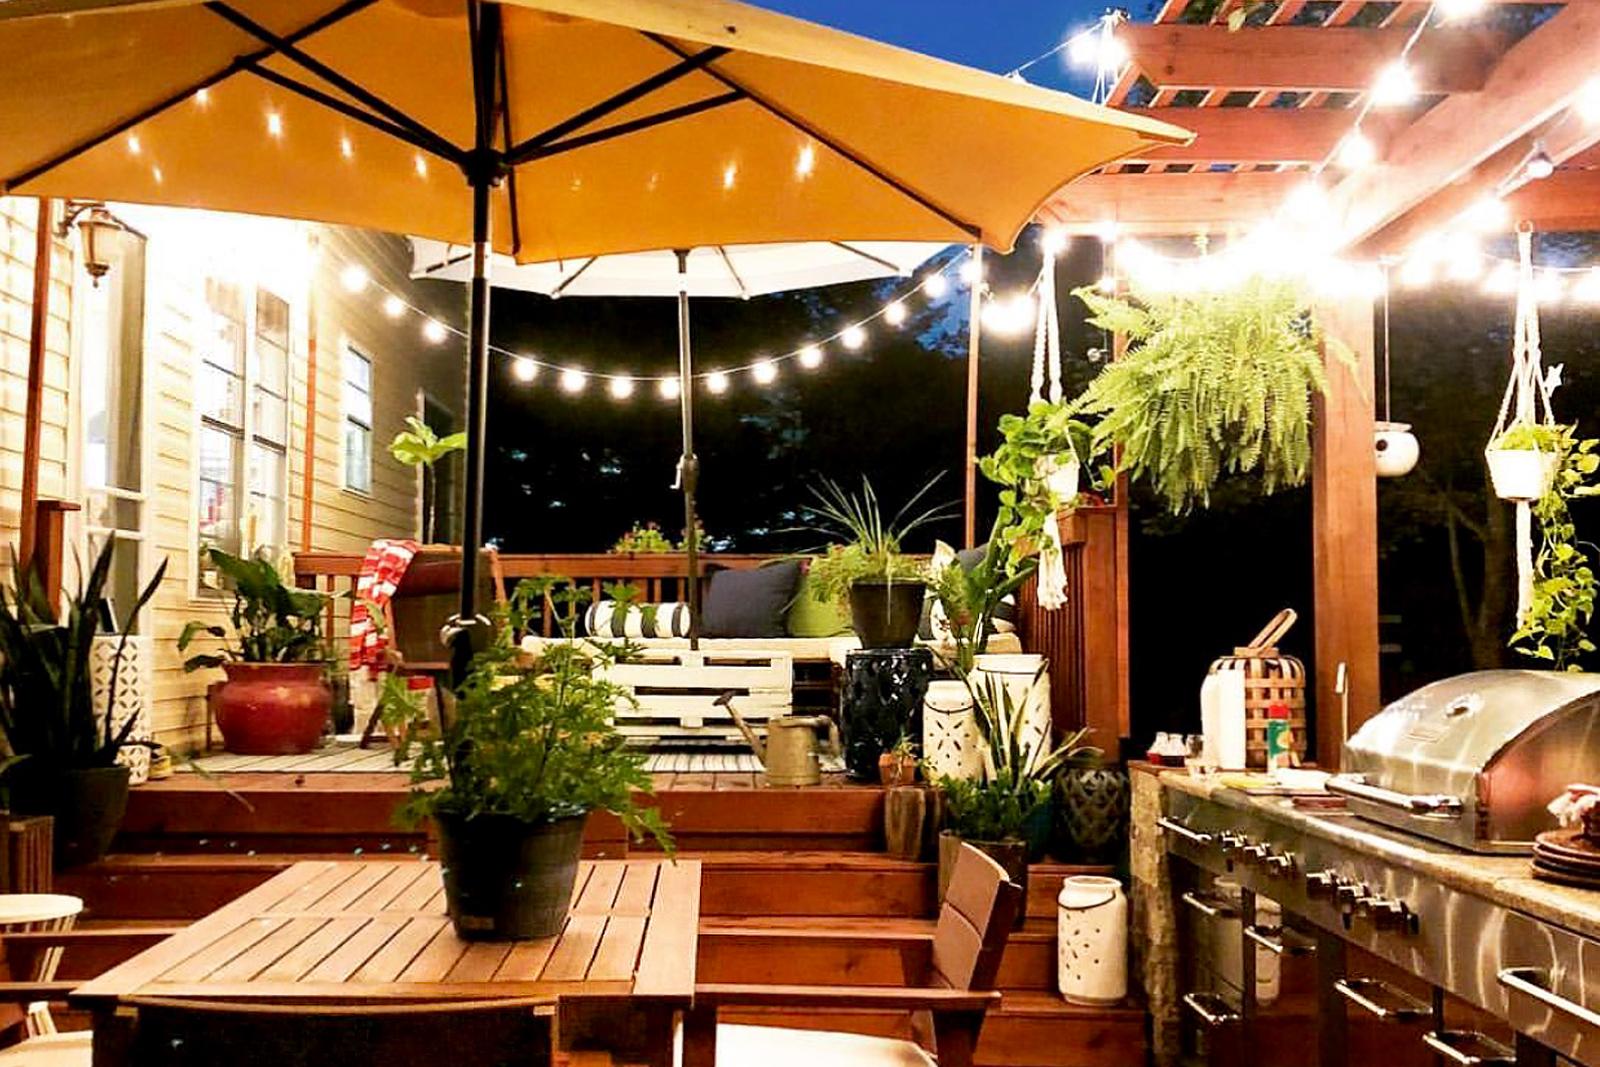 Outdoor Kitchen | Building an Outdoor Kitchen | HouseLogic